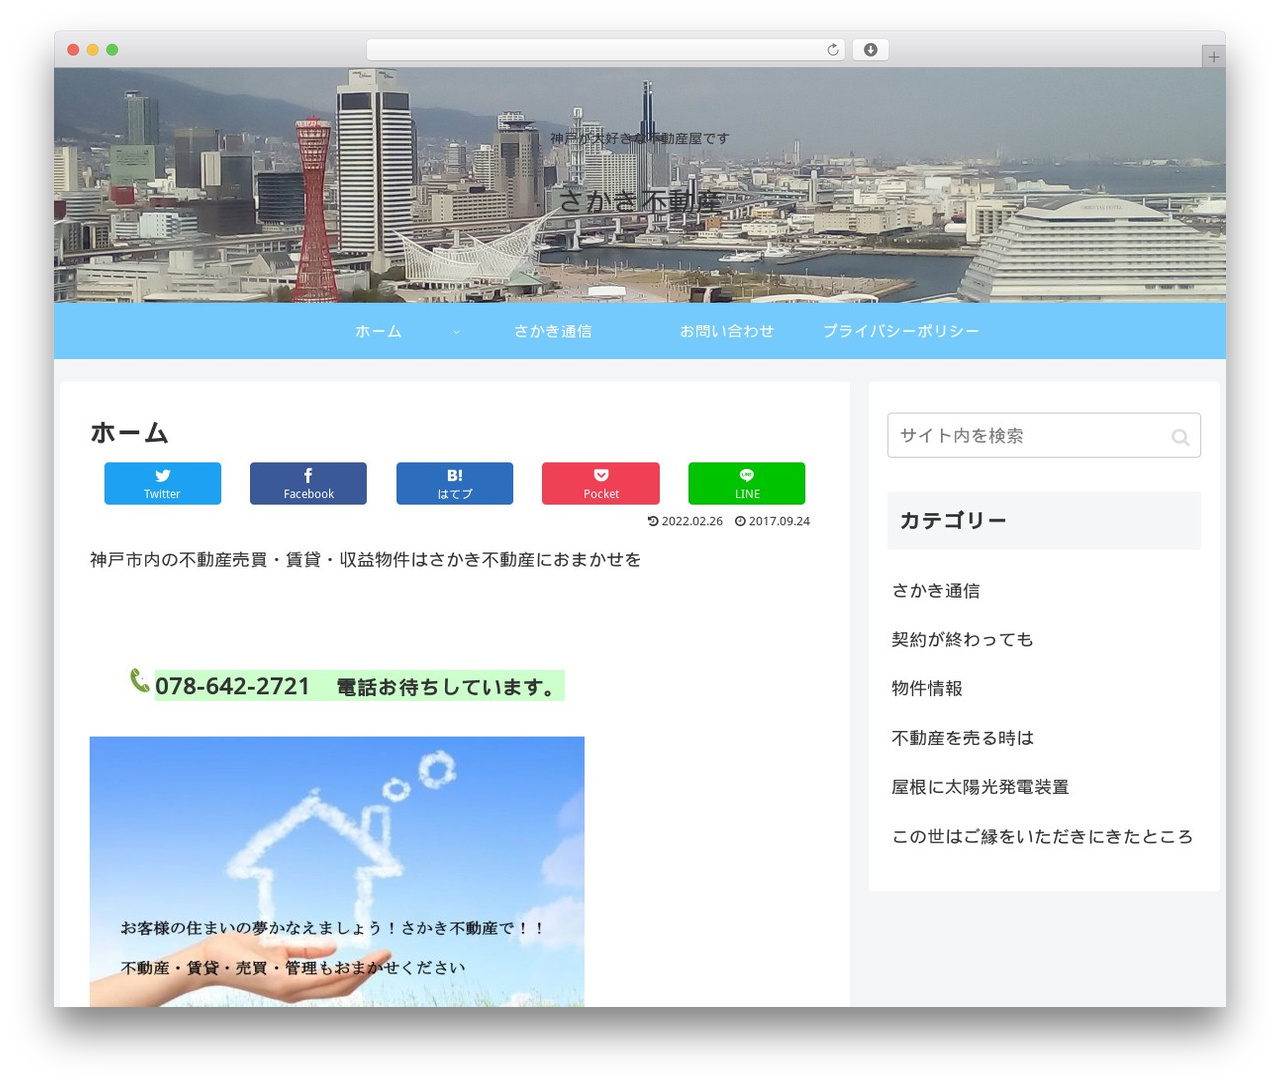 WordPress website template Cocoon Child - sakakifudousan.com